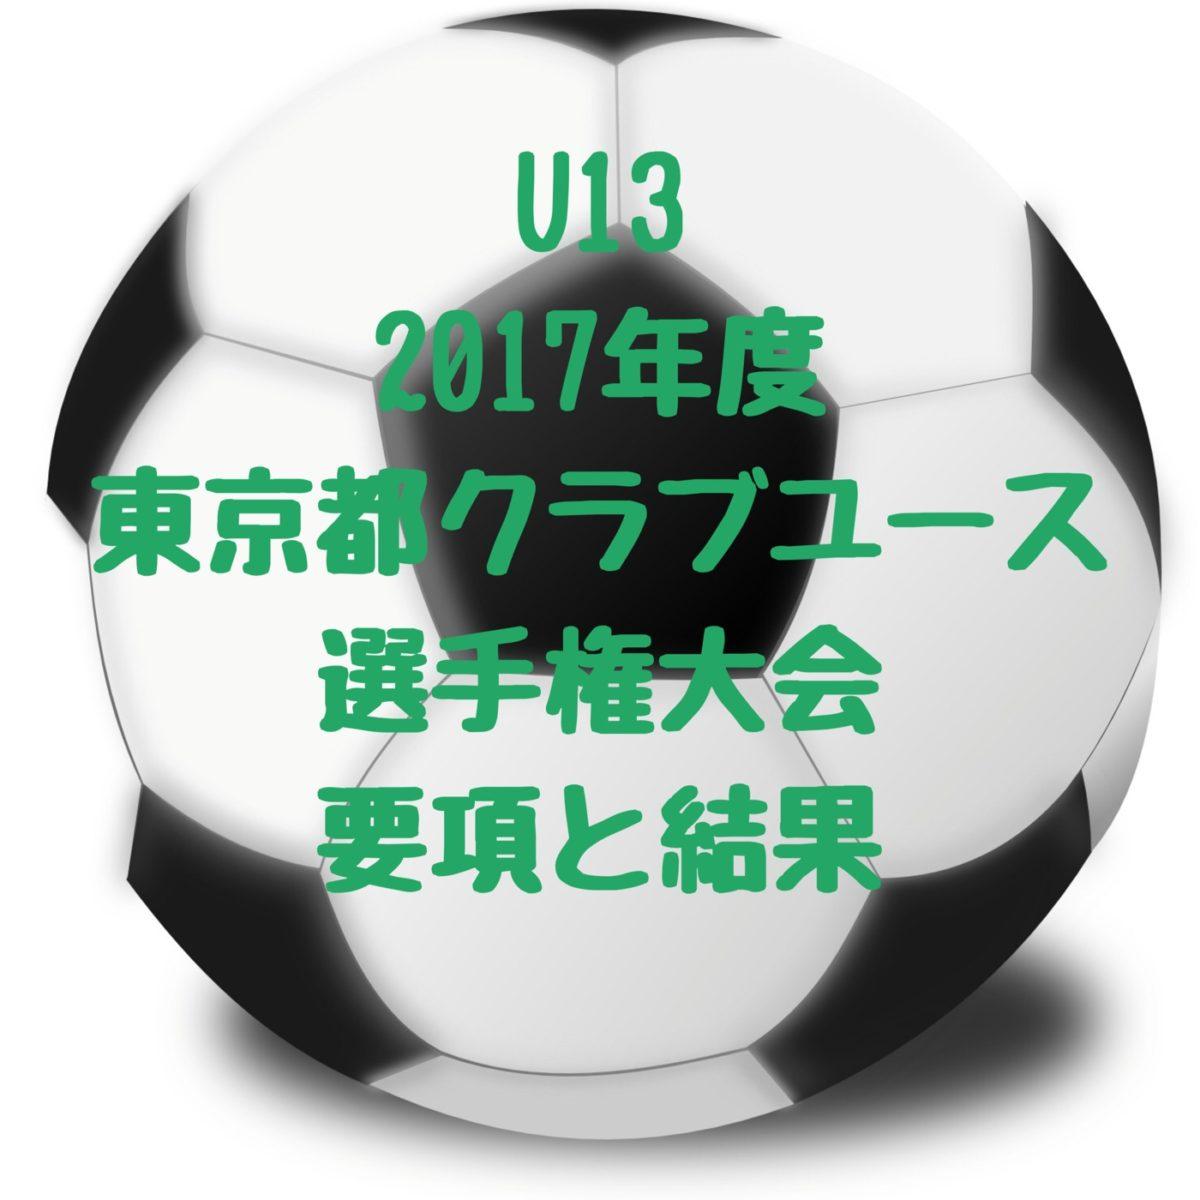 関東 リーグ u13